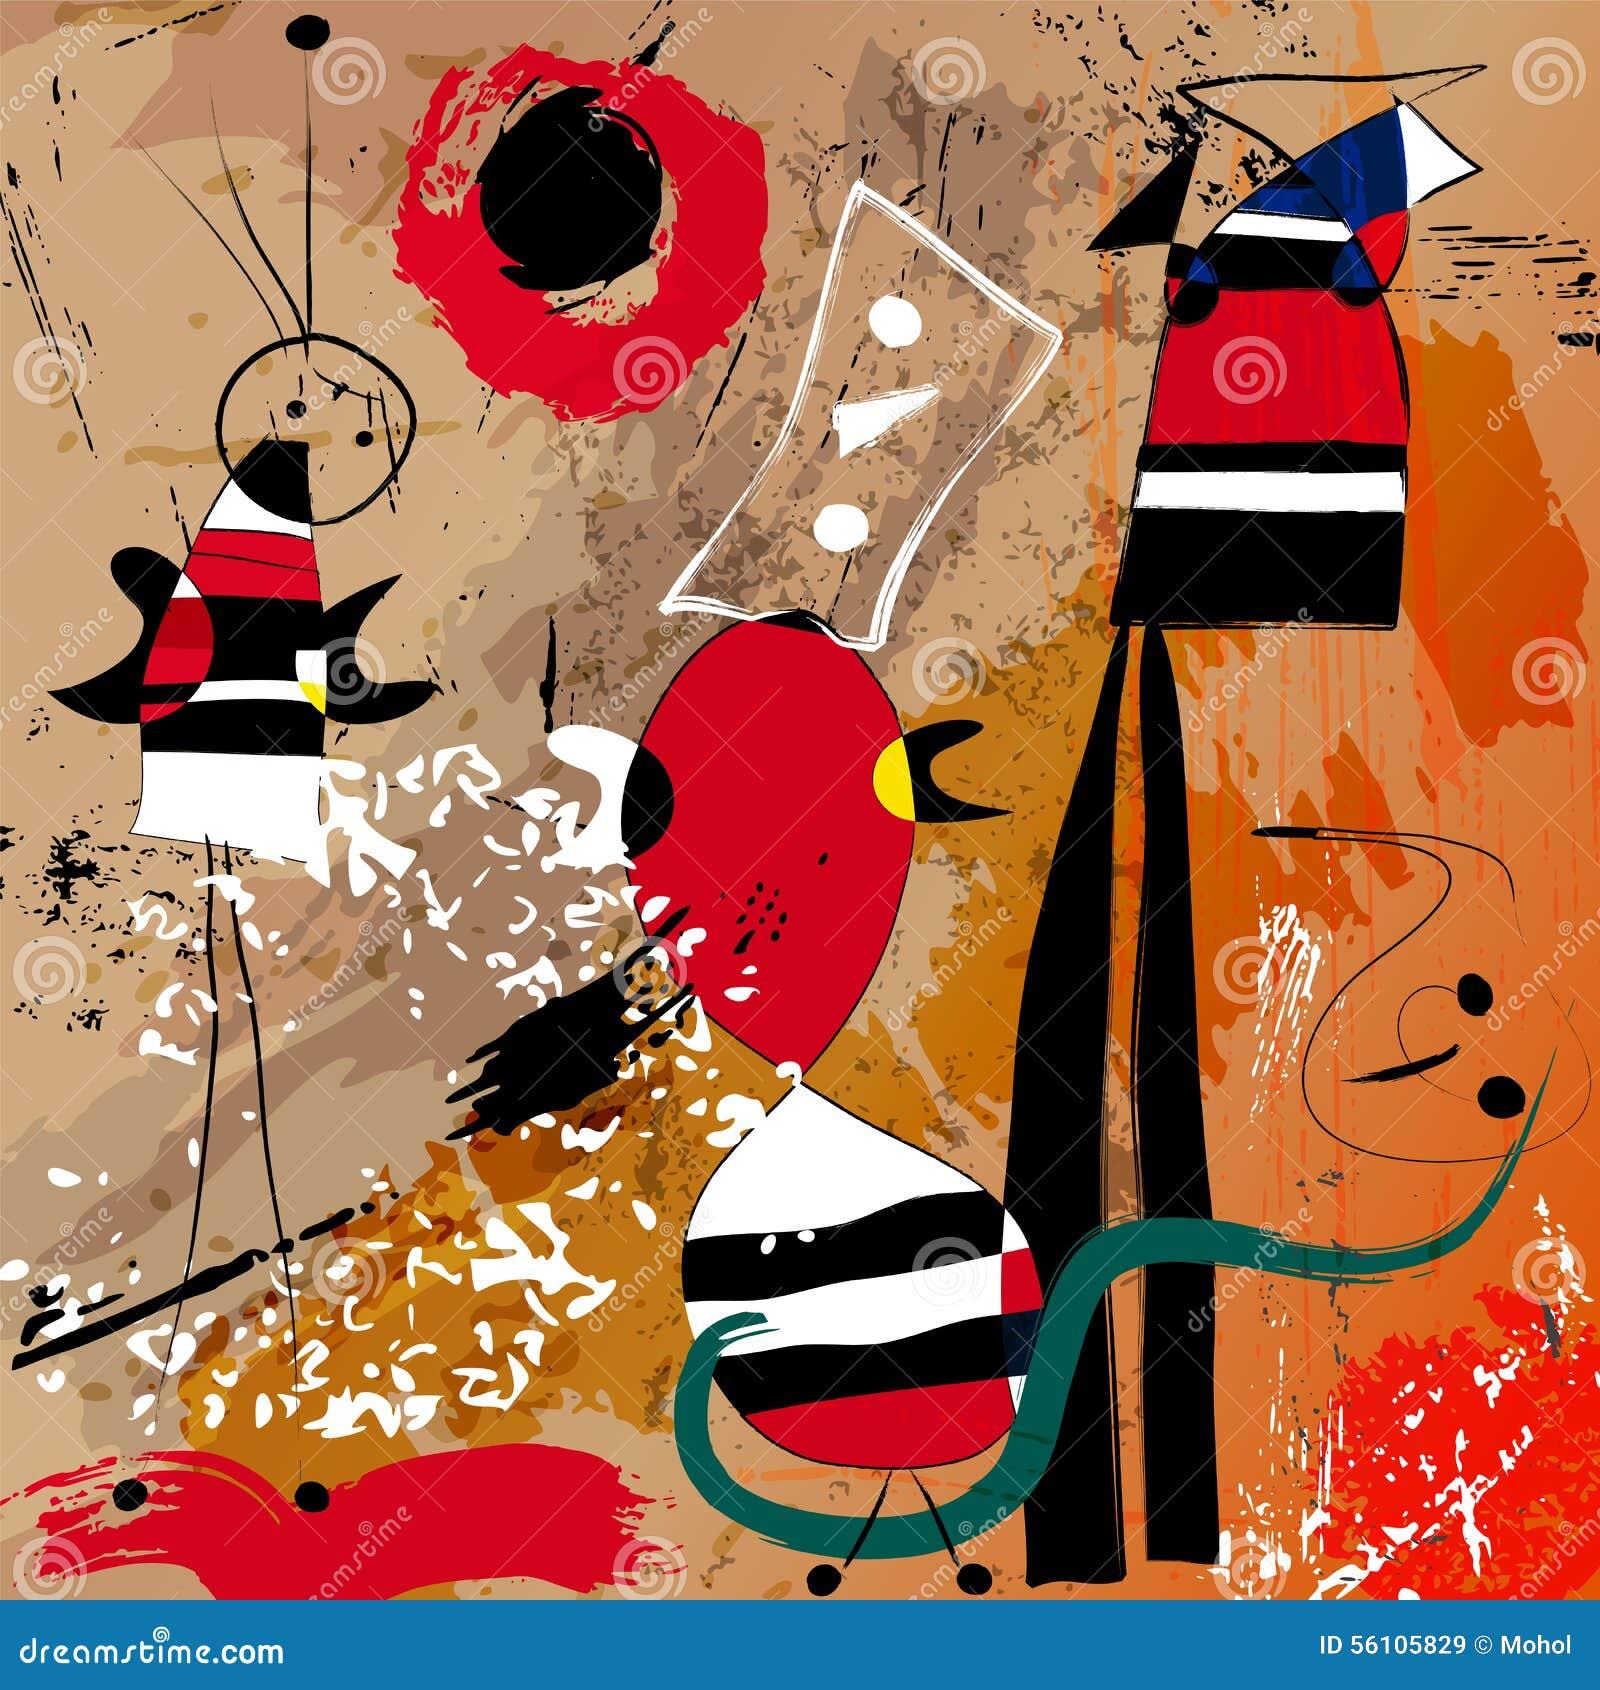 Fictional artwork modern art style